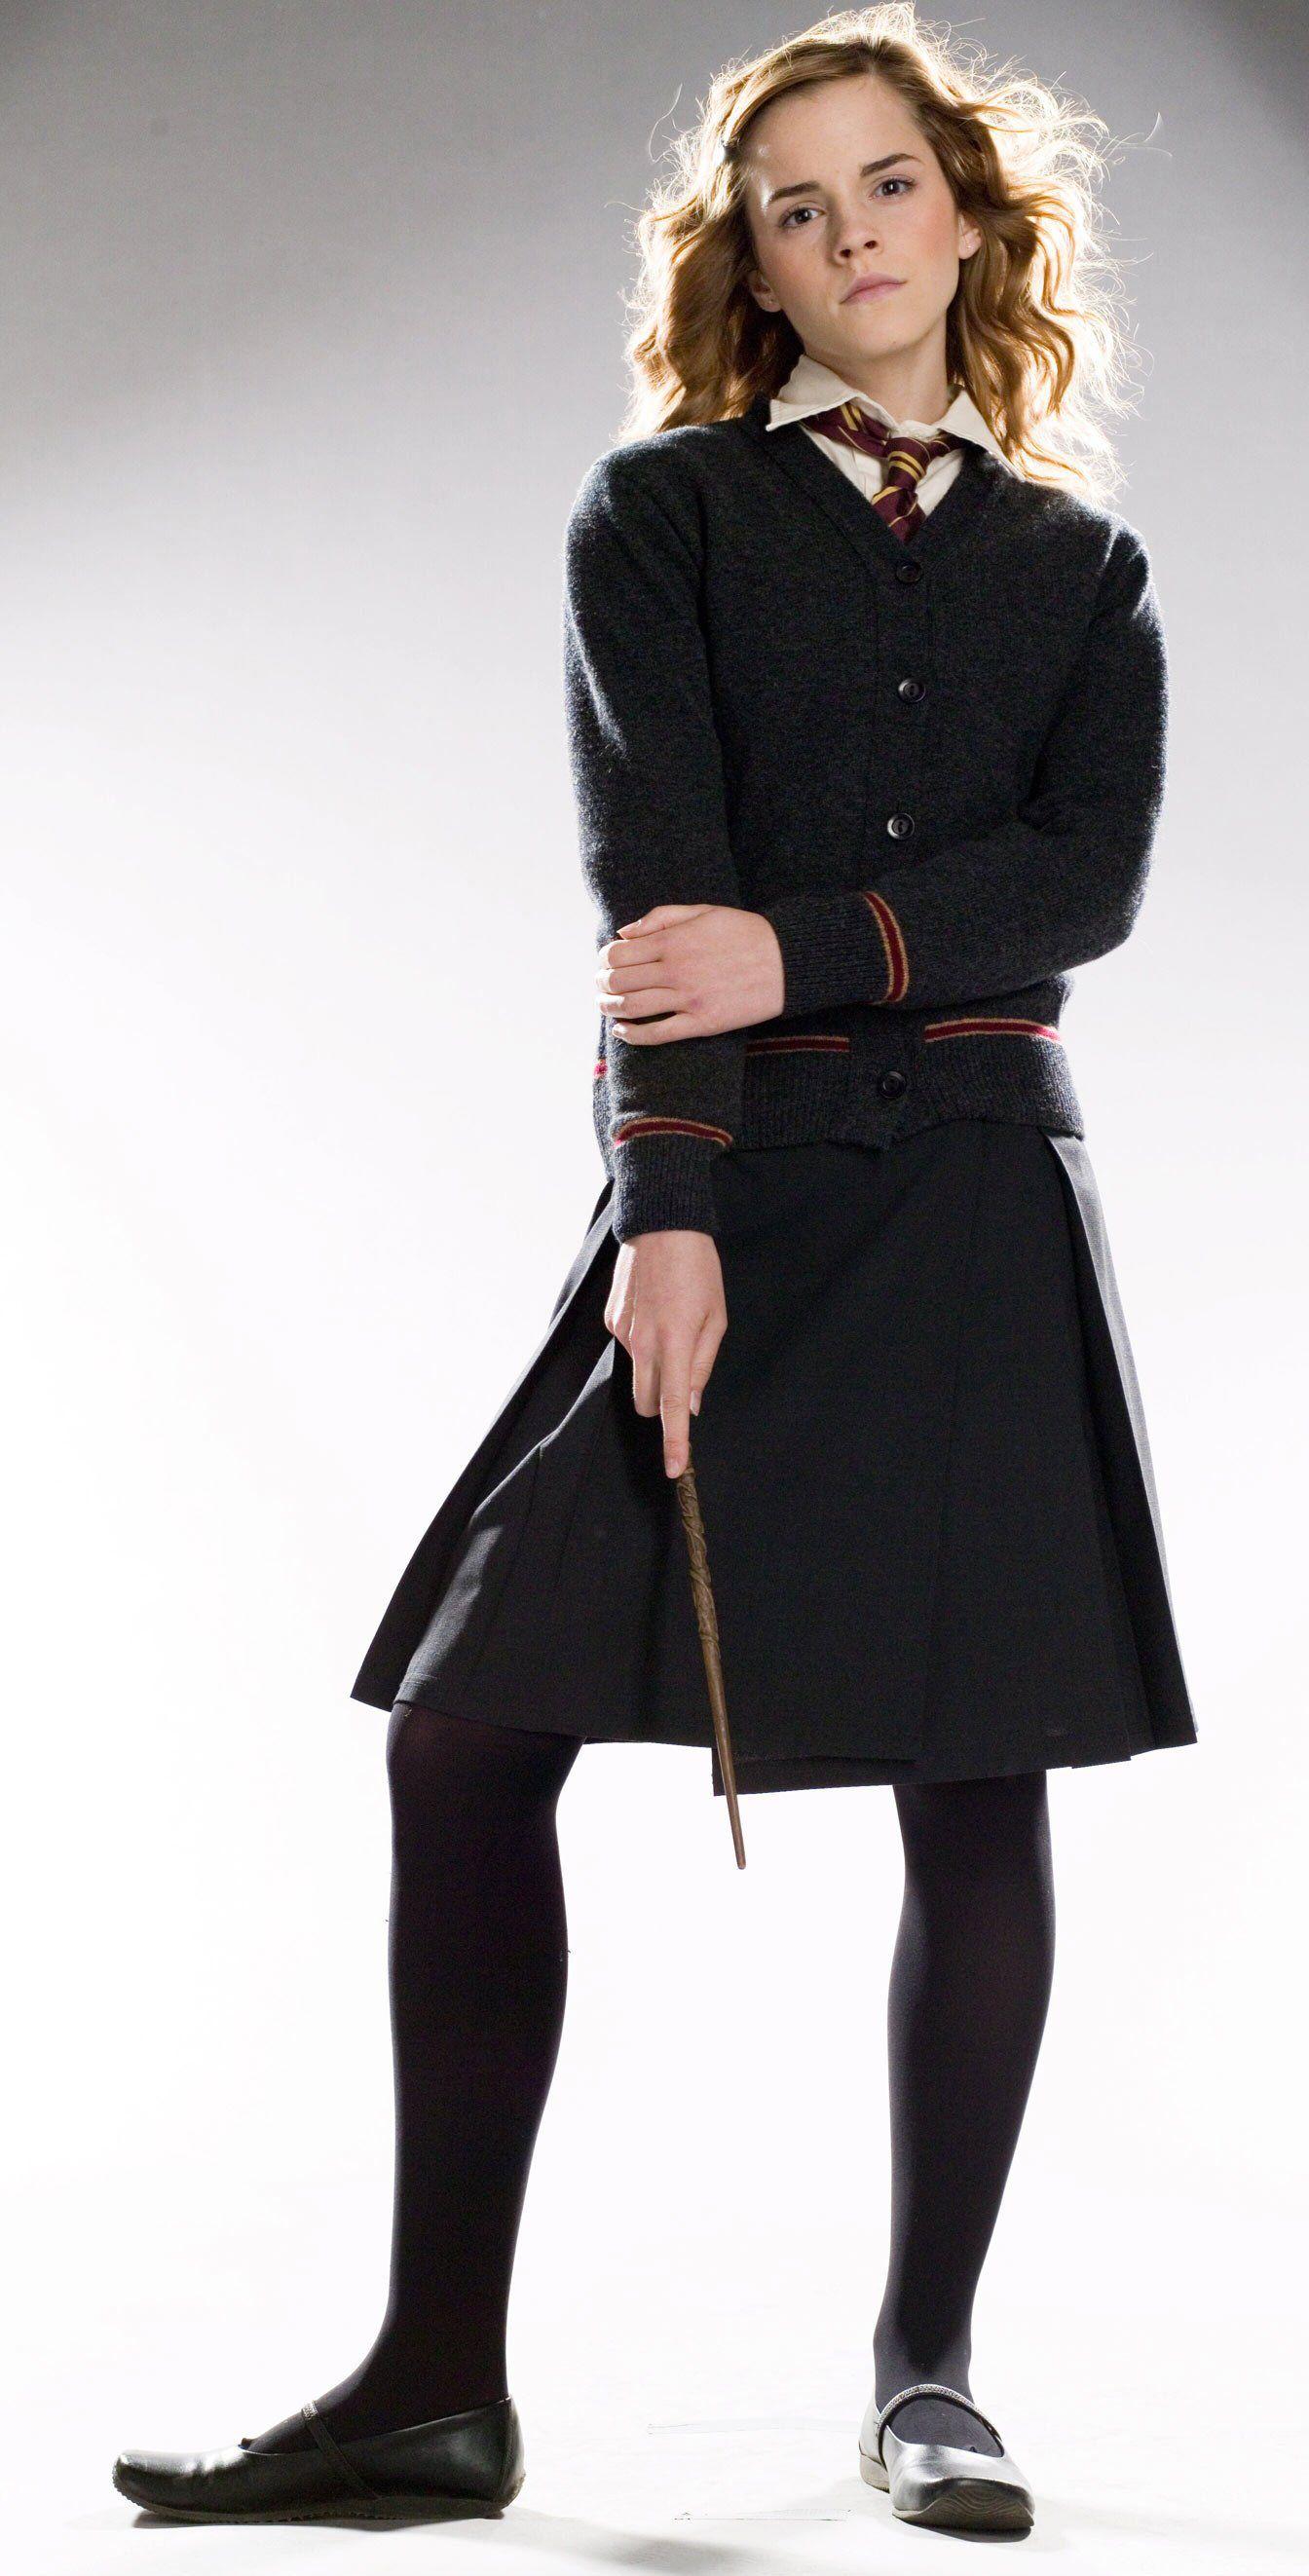 Emma Watson 2007 Harry Potter Promo Harry Potter Girl Costume Hermione Costume Harry Potter Girl